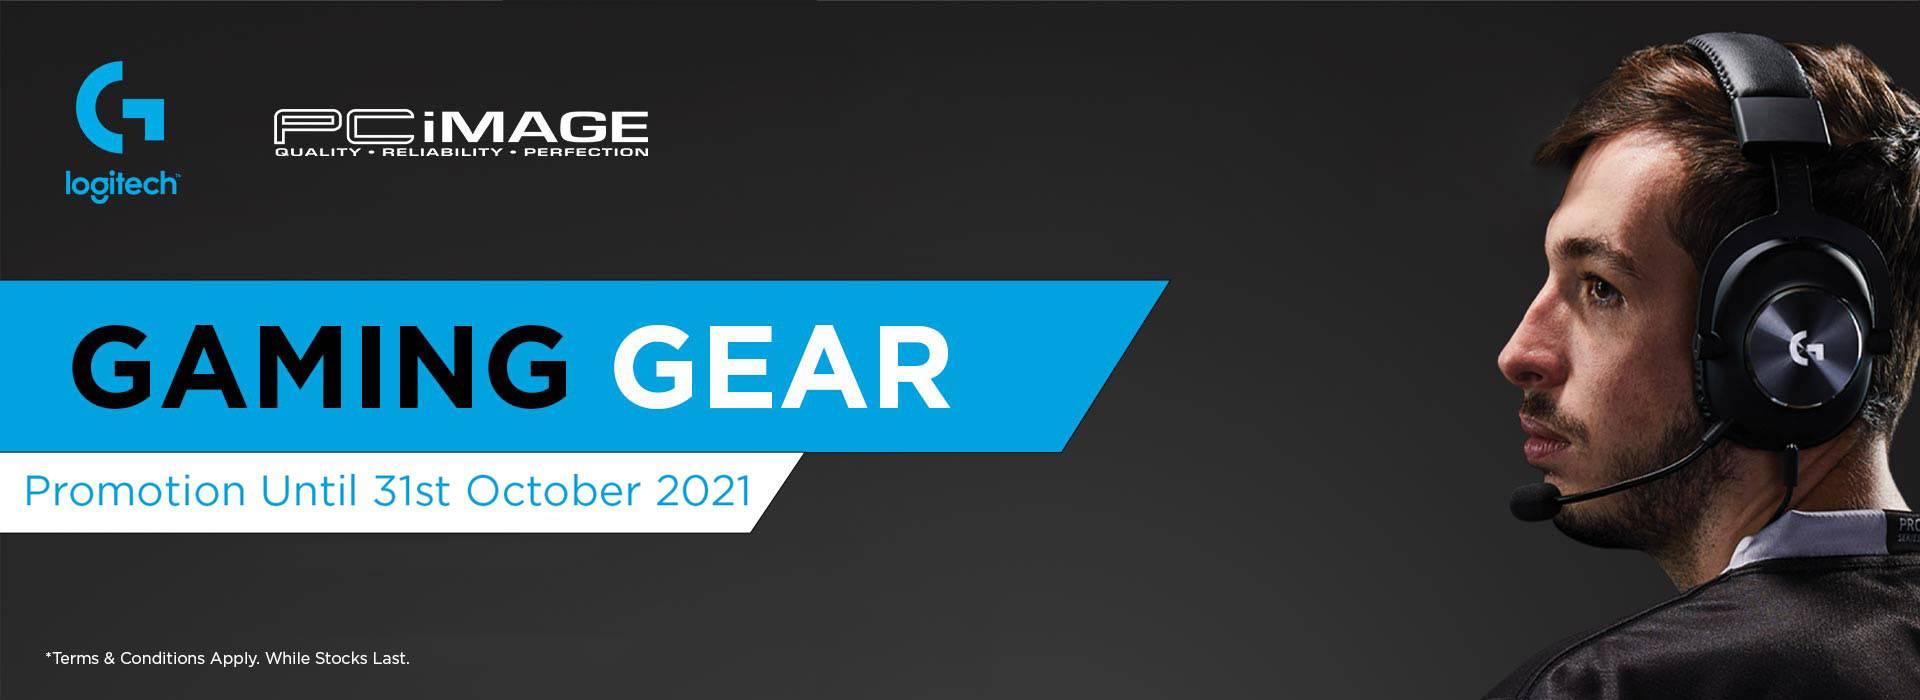 Logitech Gaming 31 Oct